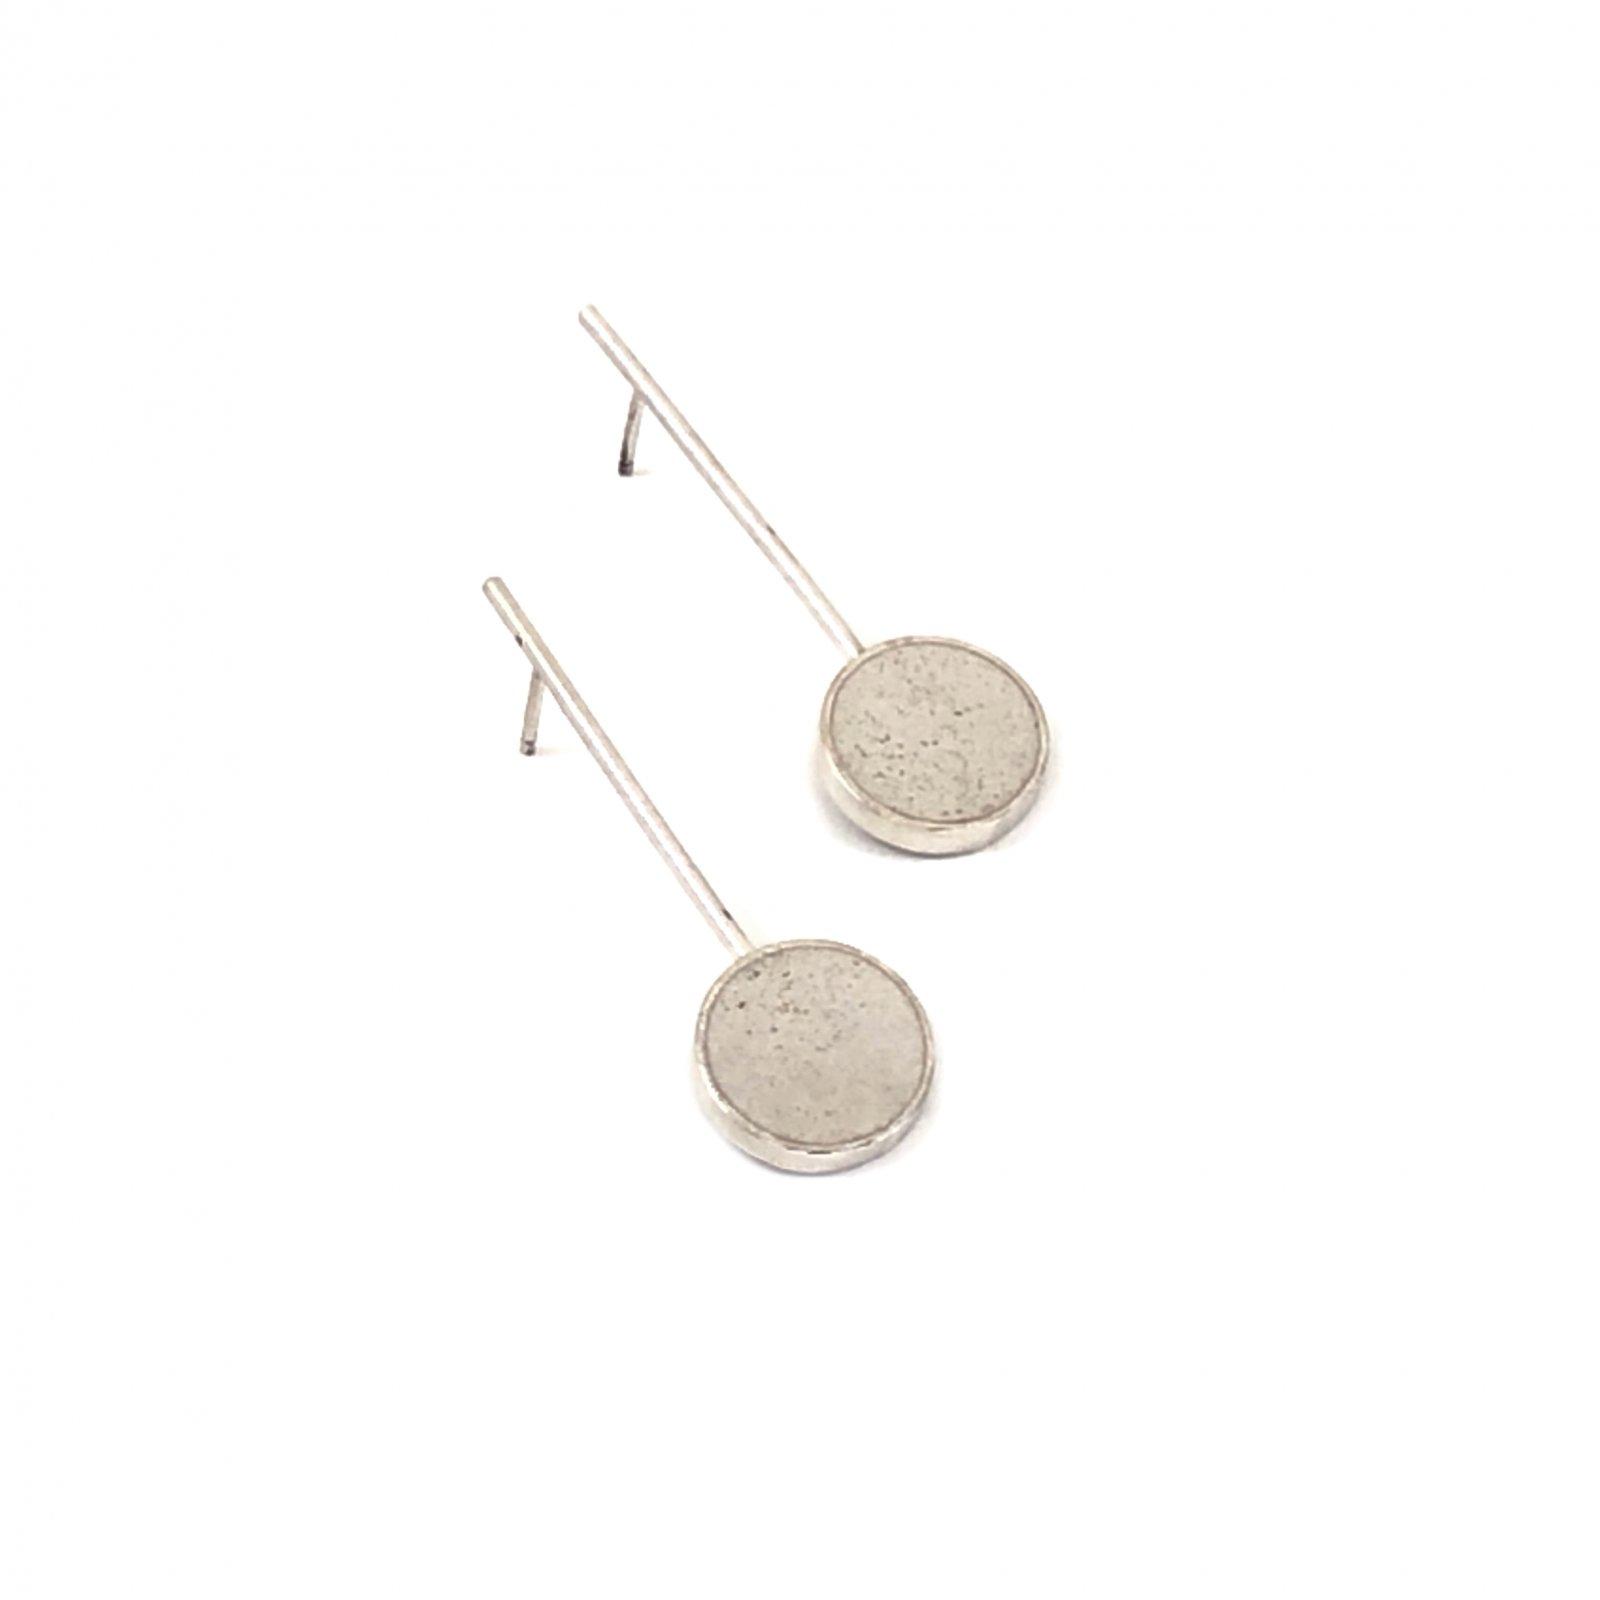 JLB Concrete Circle Drop Earrings